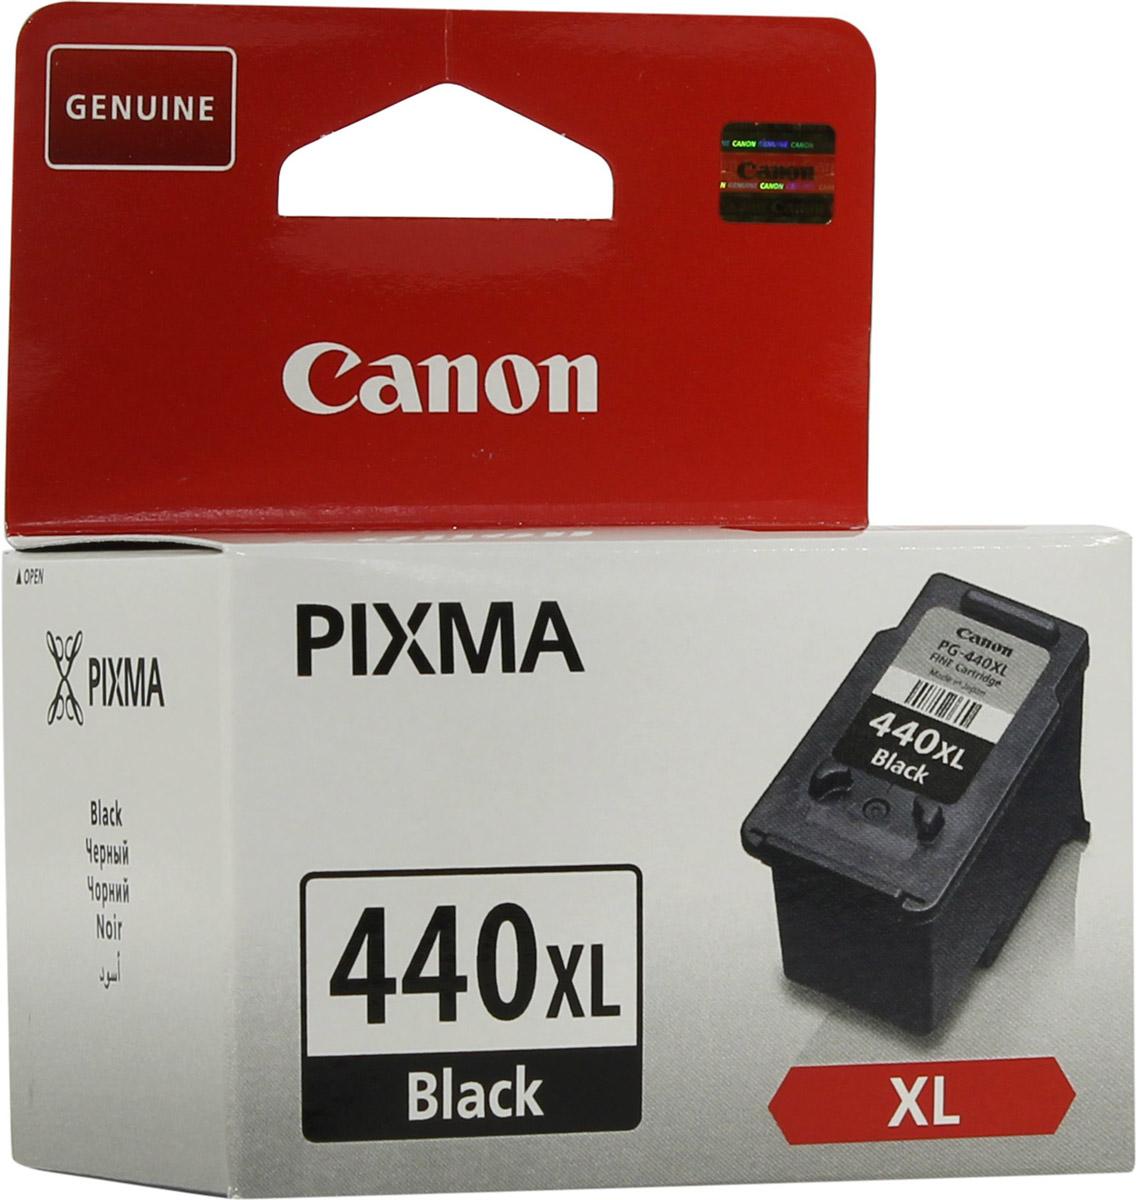 Canon PG-440 BK XL, Black картридж для струйных принтеров Pixma MG2140/MG3140/MG4140/MX374/MX434/MX514